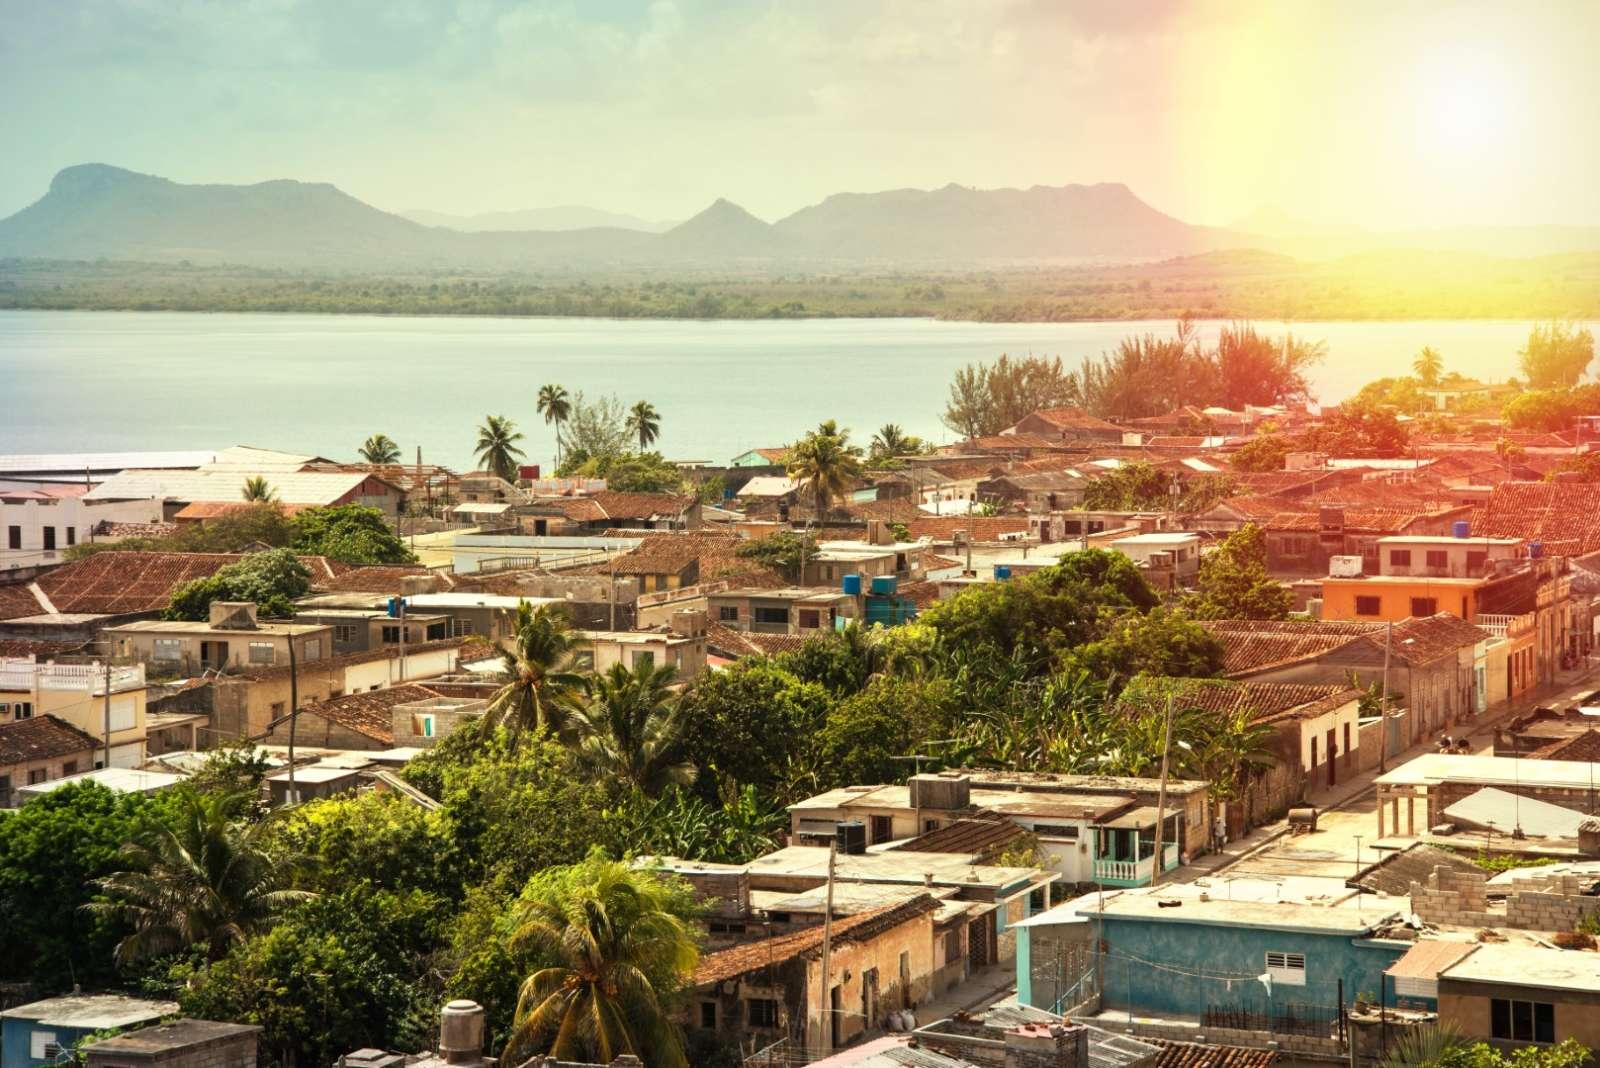 Panoramic view over the town of Gibara, near Guardalavaca in Cuba